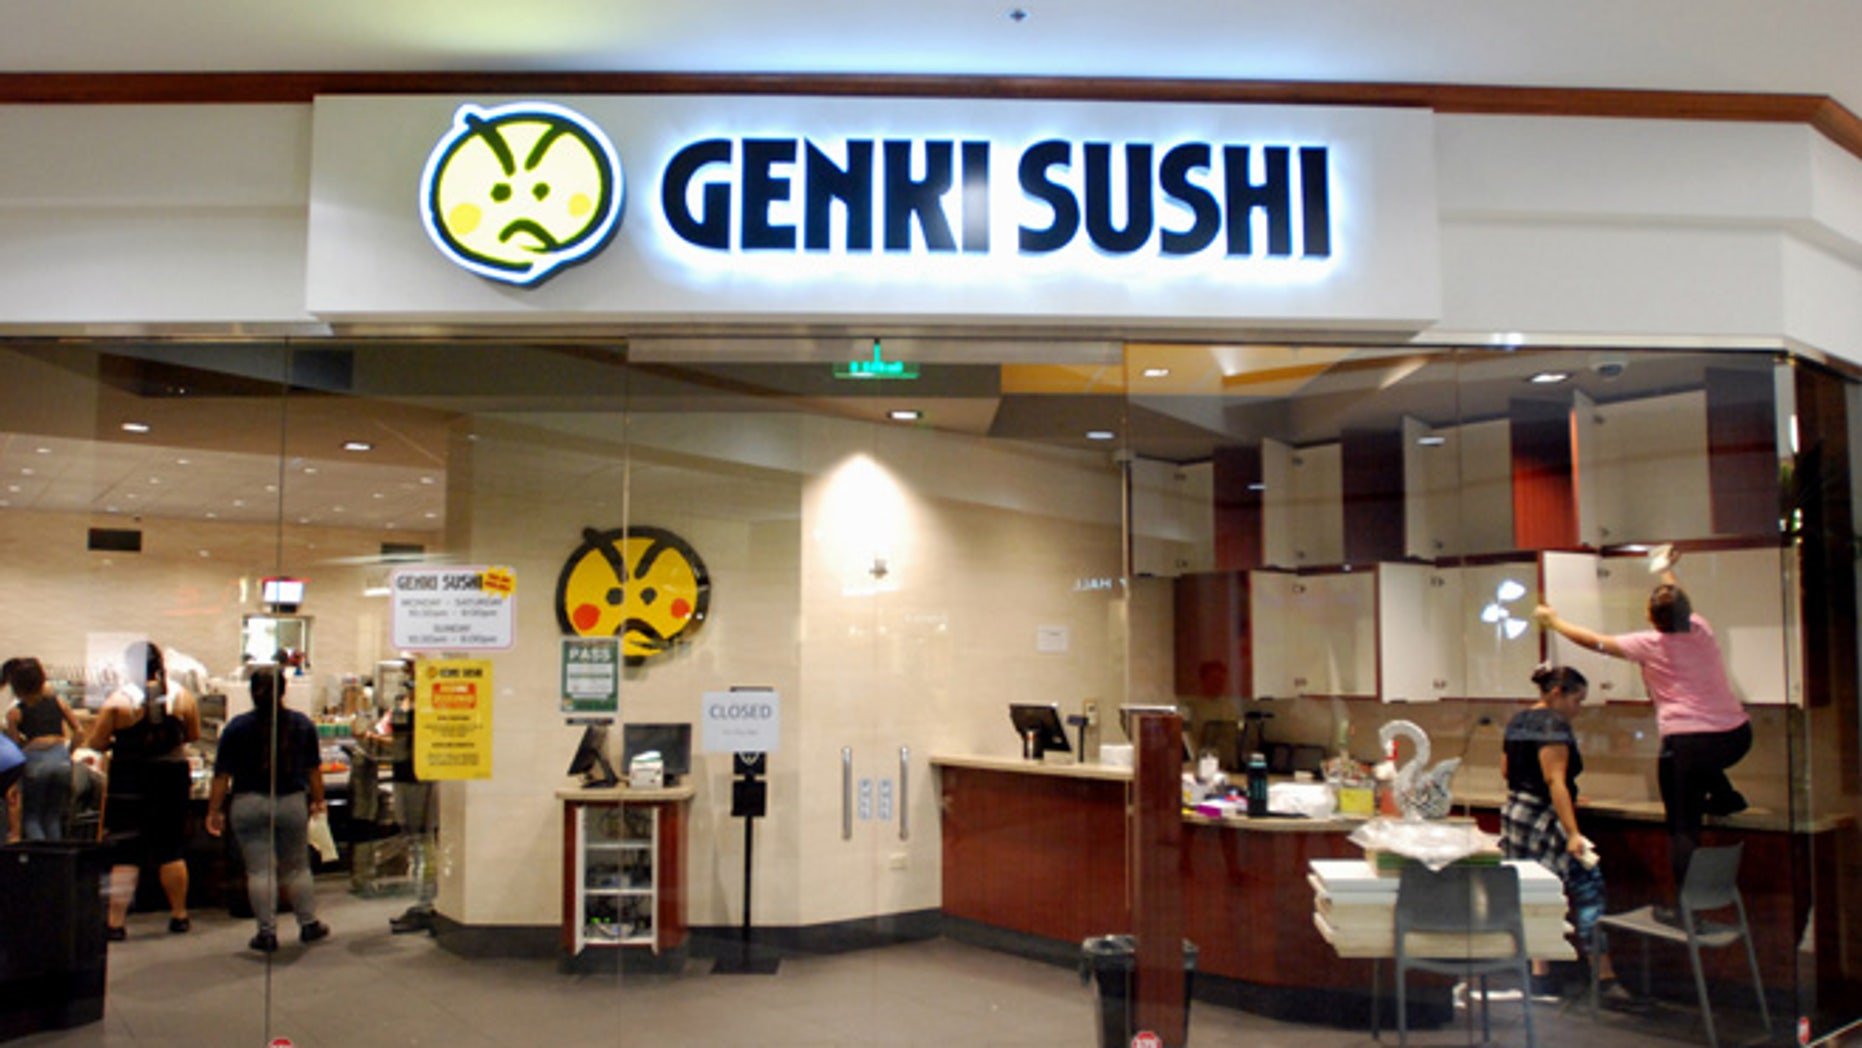 Employees clean the Genki Sushi conveyor belt restaurant chain Tuesday, Aug. 16, 2016, in Aiea, Hawaii.